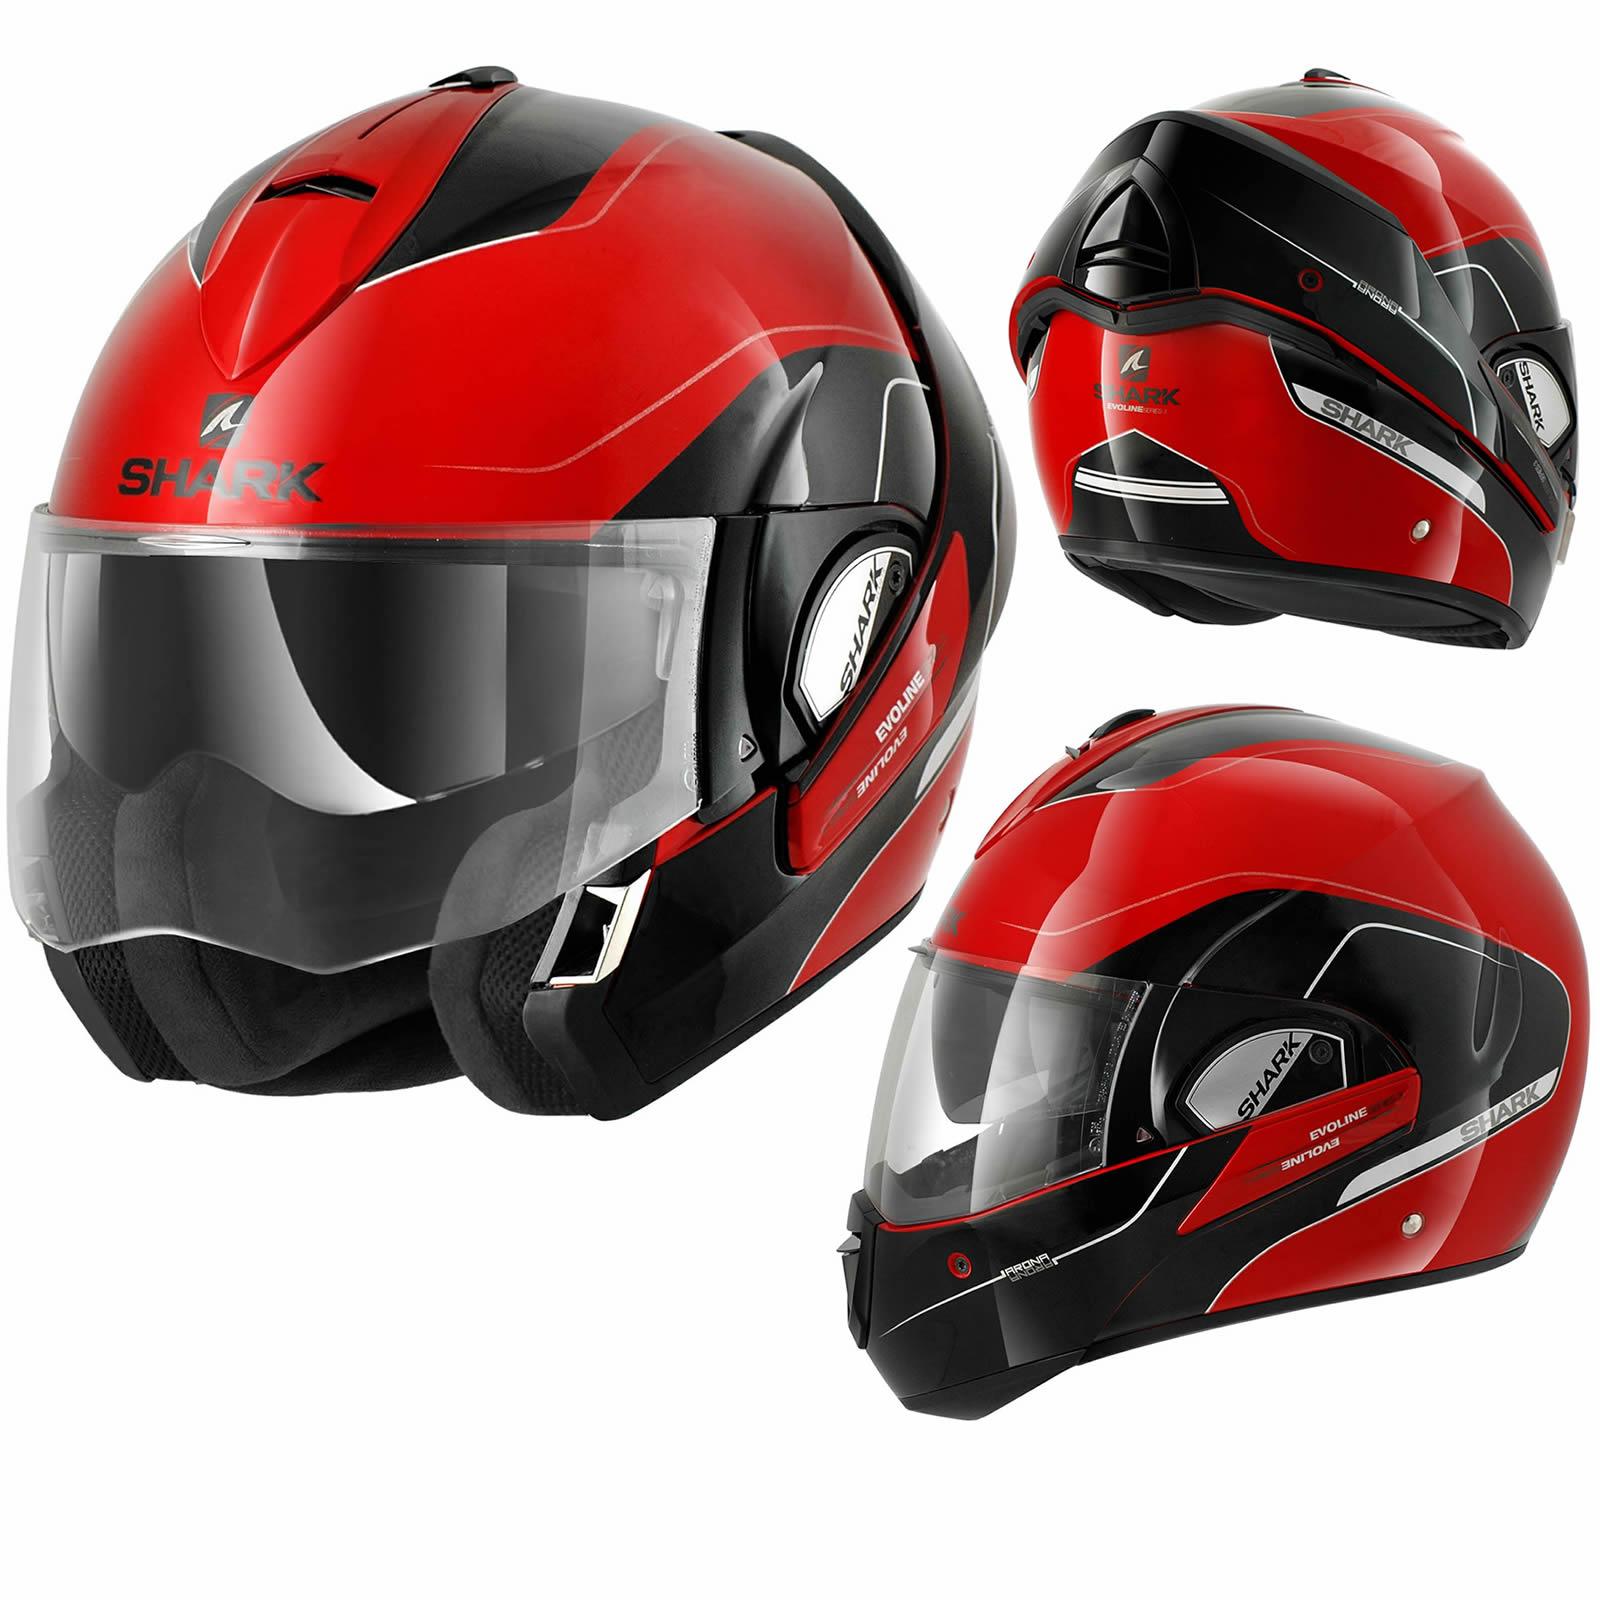 Shark Helmets DOT E-CE Approved, Any color & Size on stock